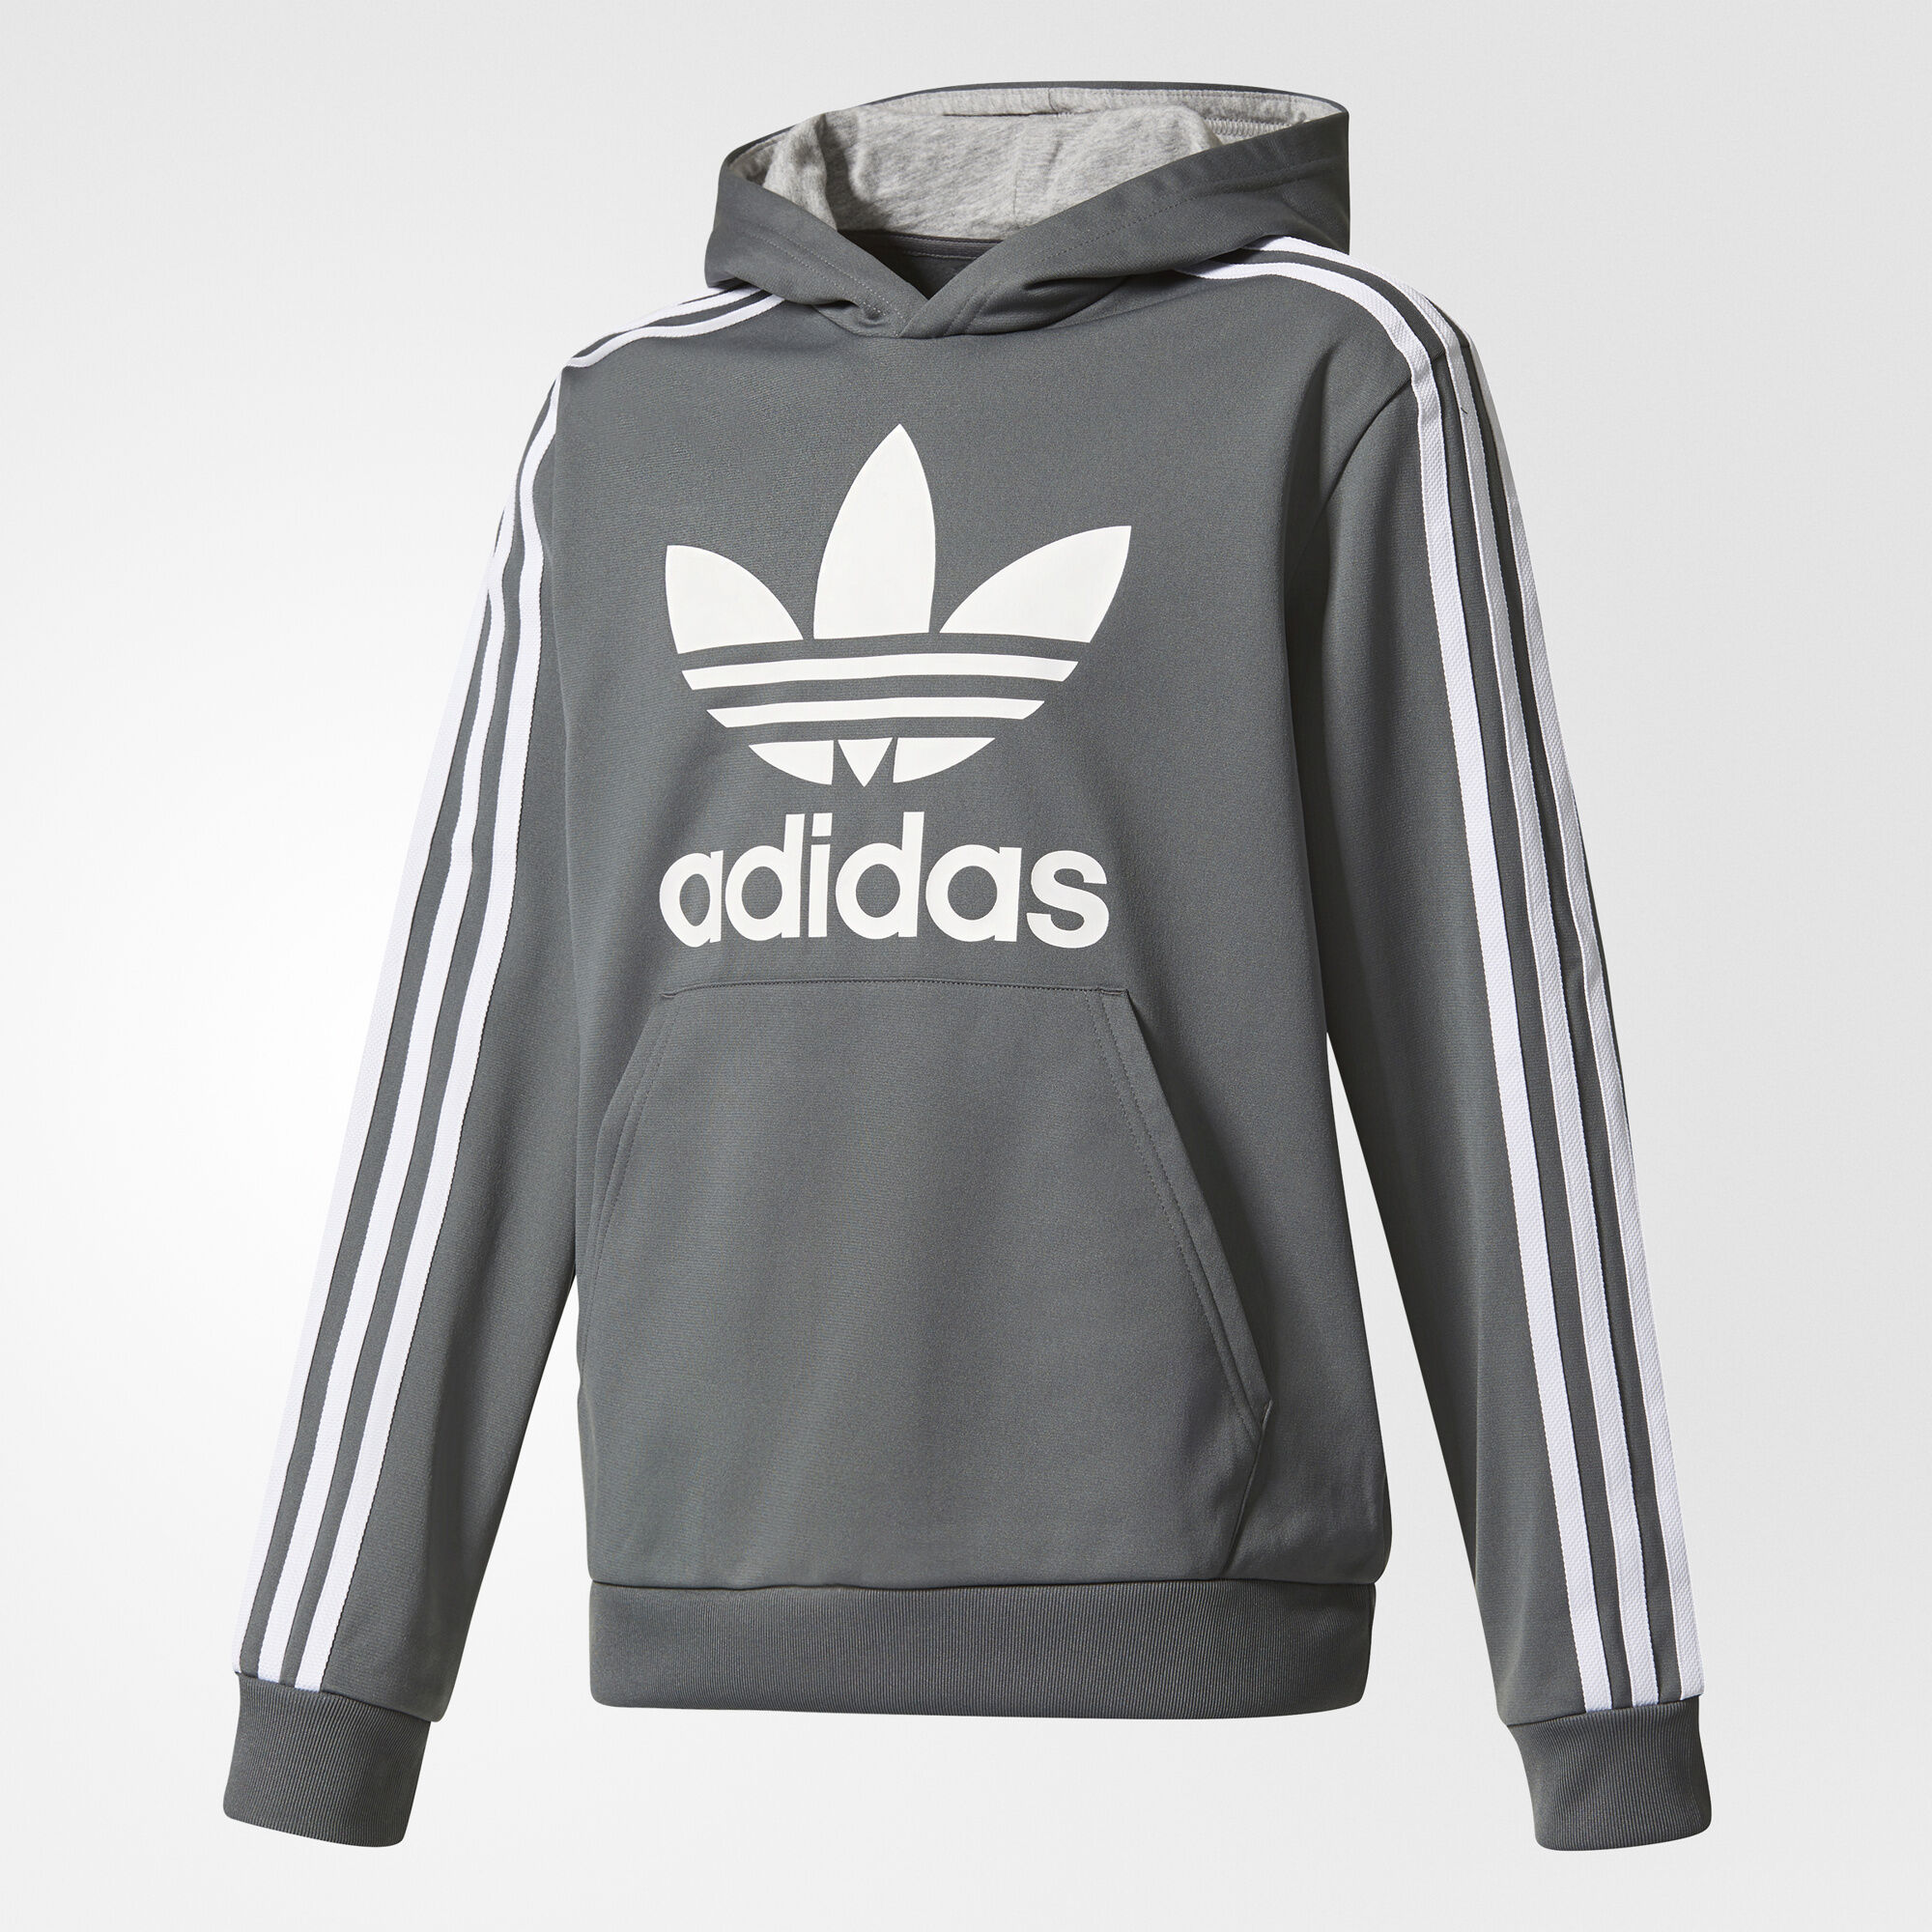 Adidas sweater kids cheap cheap >off54% più grande catalogo sconti